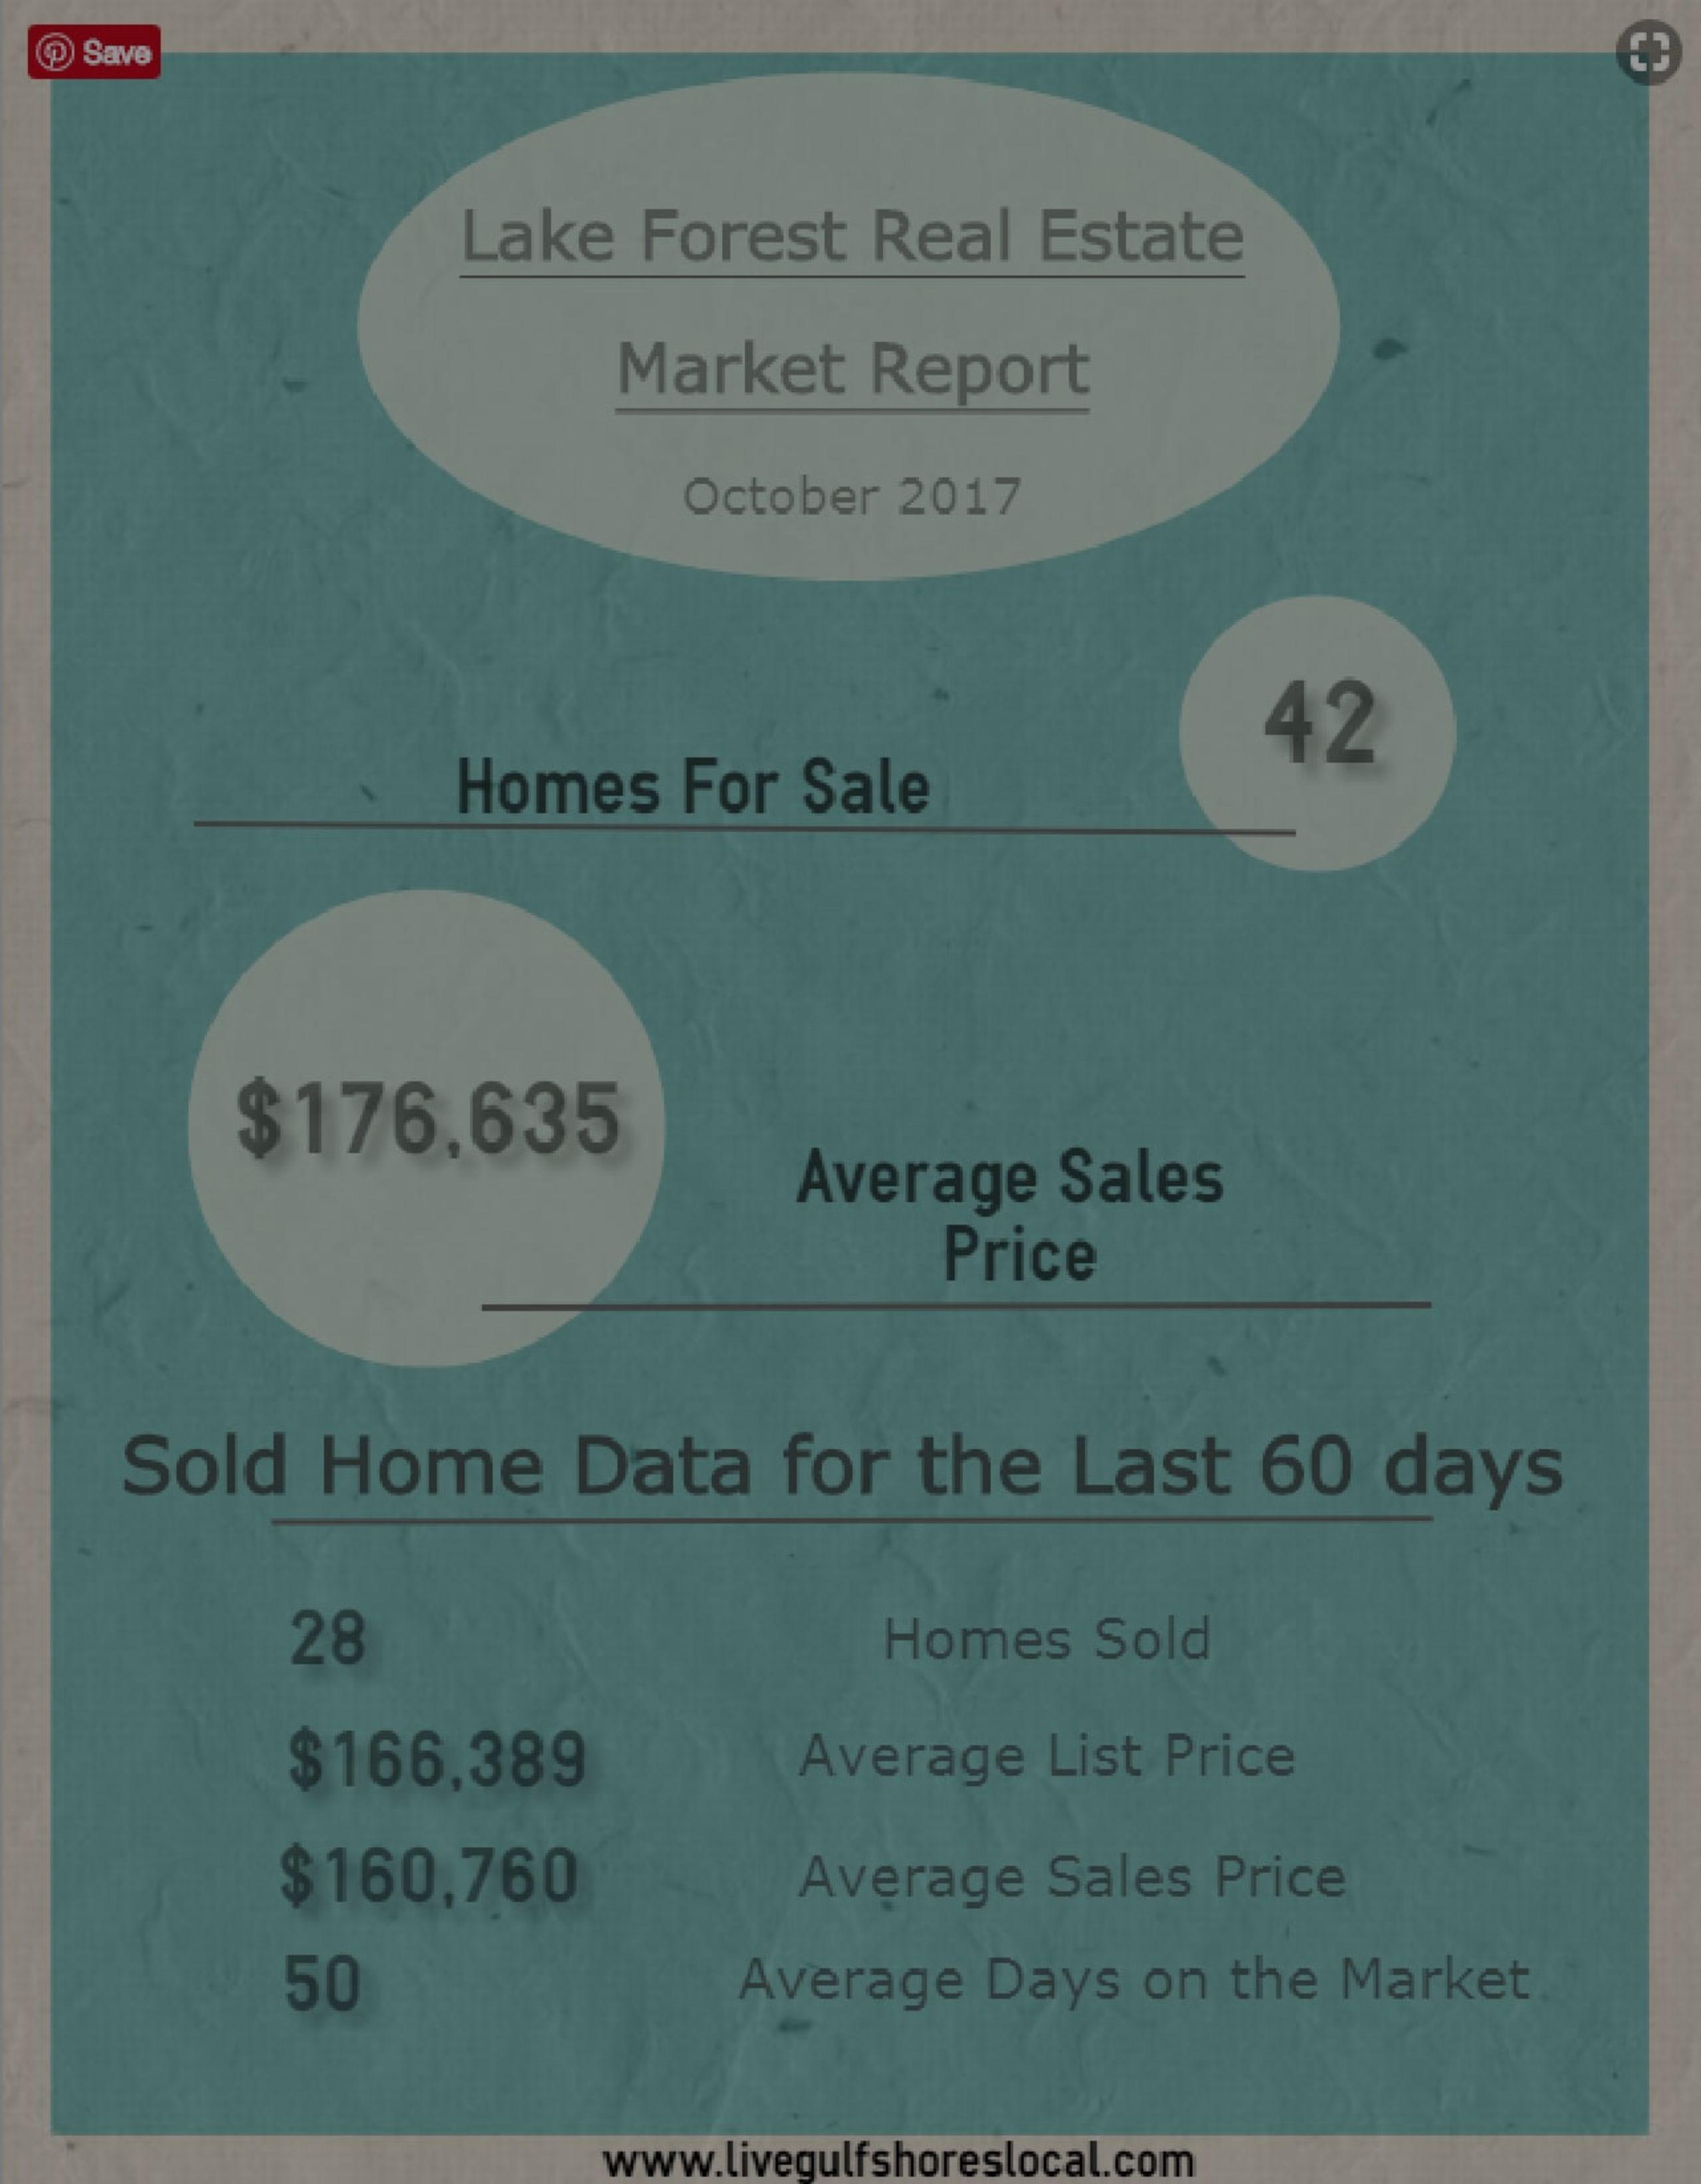 Lake Forest Real Estate Market Update – Oct 2017